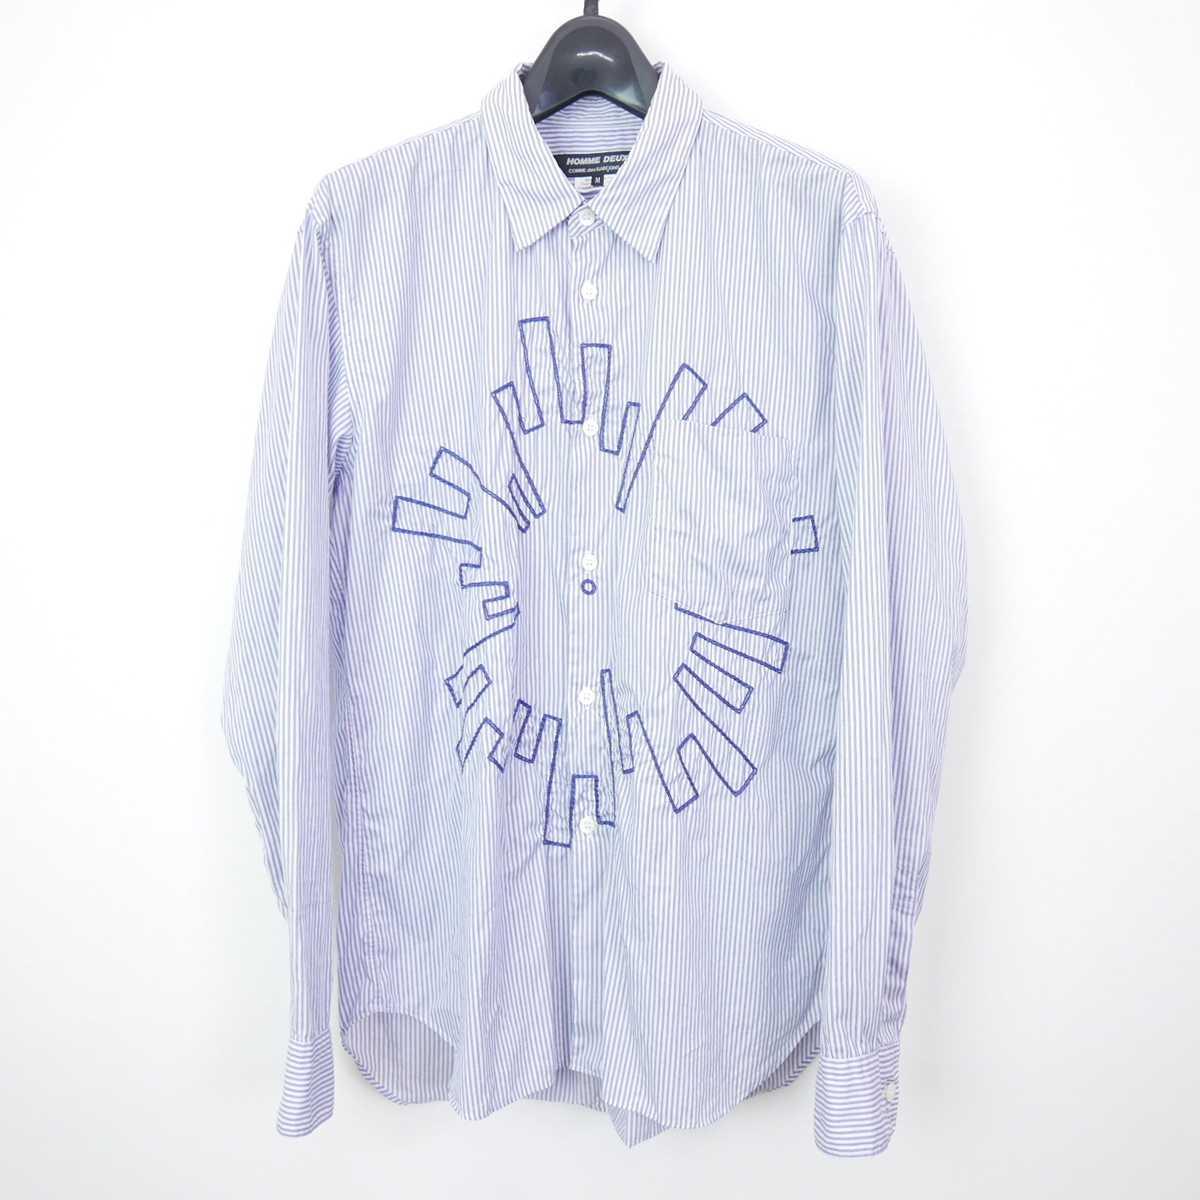 19SS AD2018 COMME des GARCONS HOMME DEUX コムデギャルソン オムドゥ コットン 長袖 ストライプ 刺繍 シャツ BLUE/WHITE M 【中古】 DN-11322